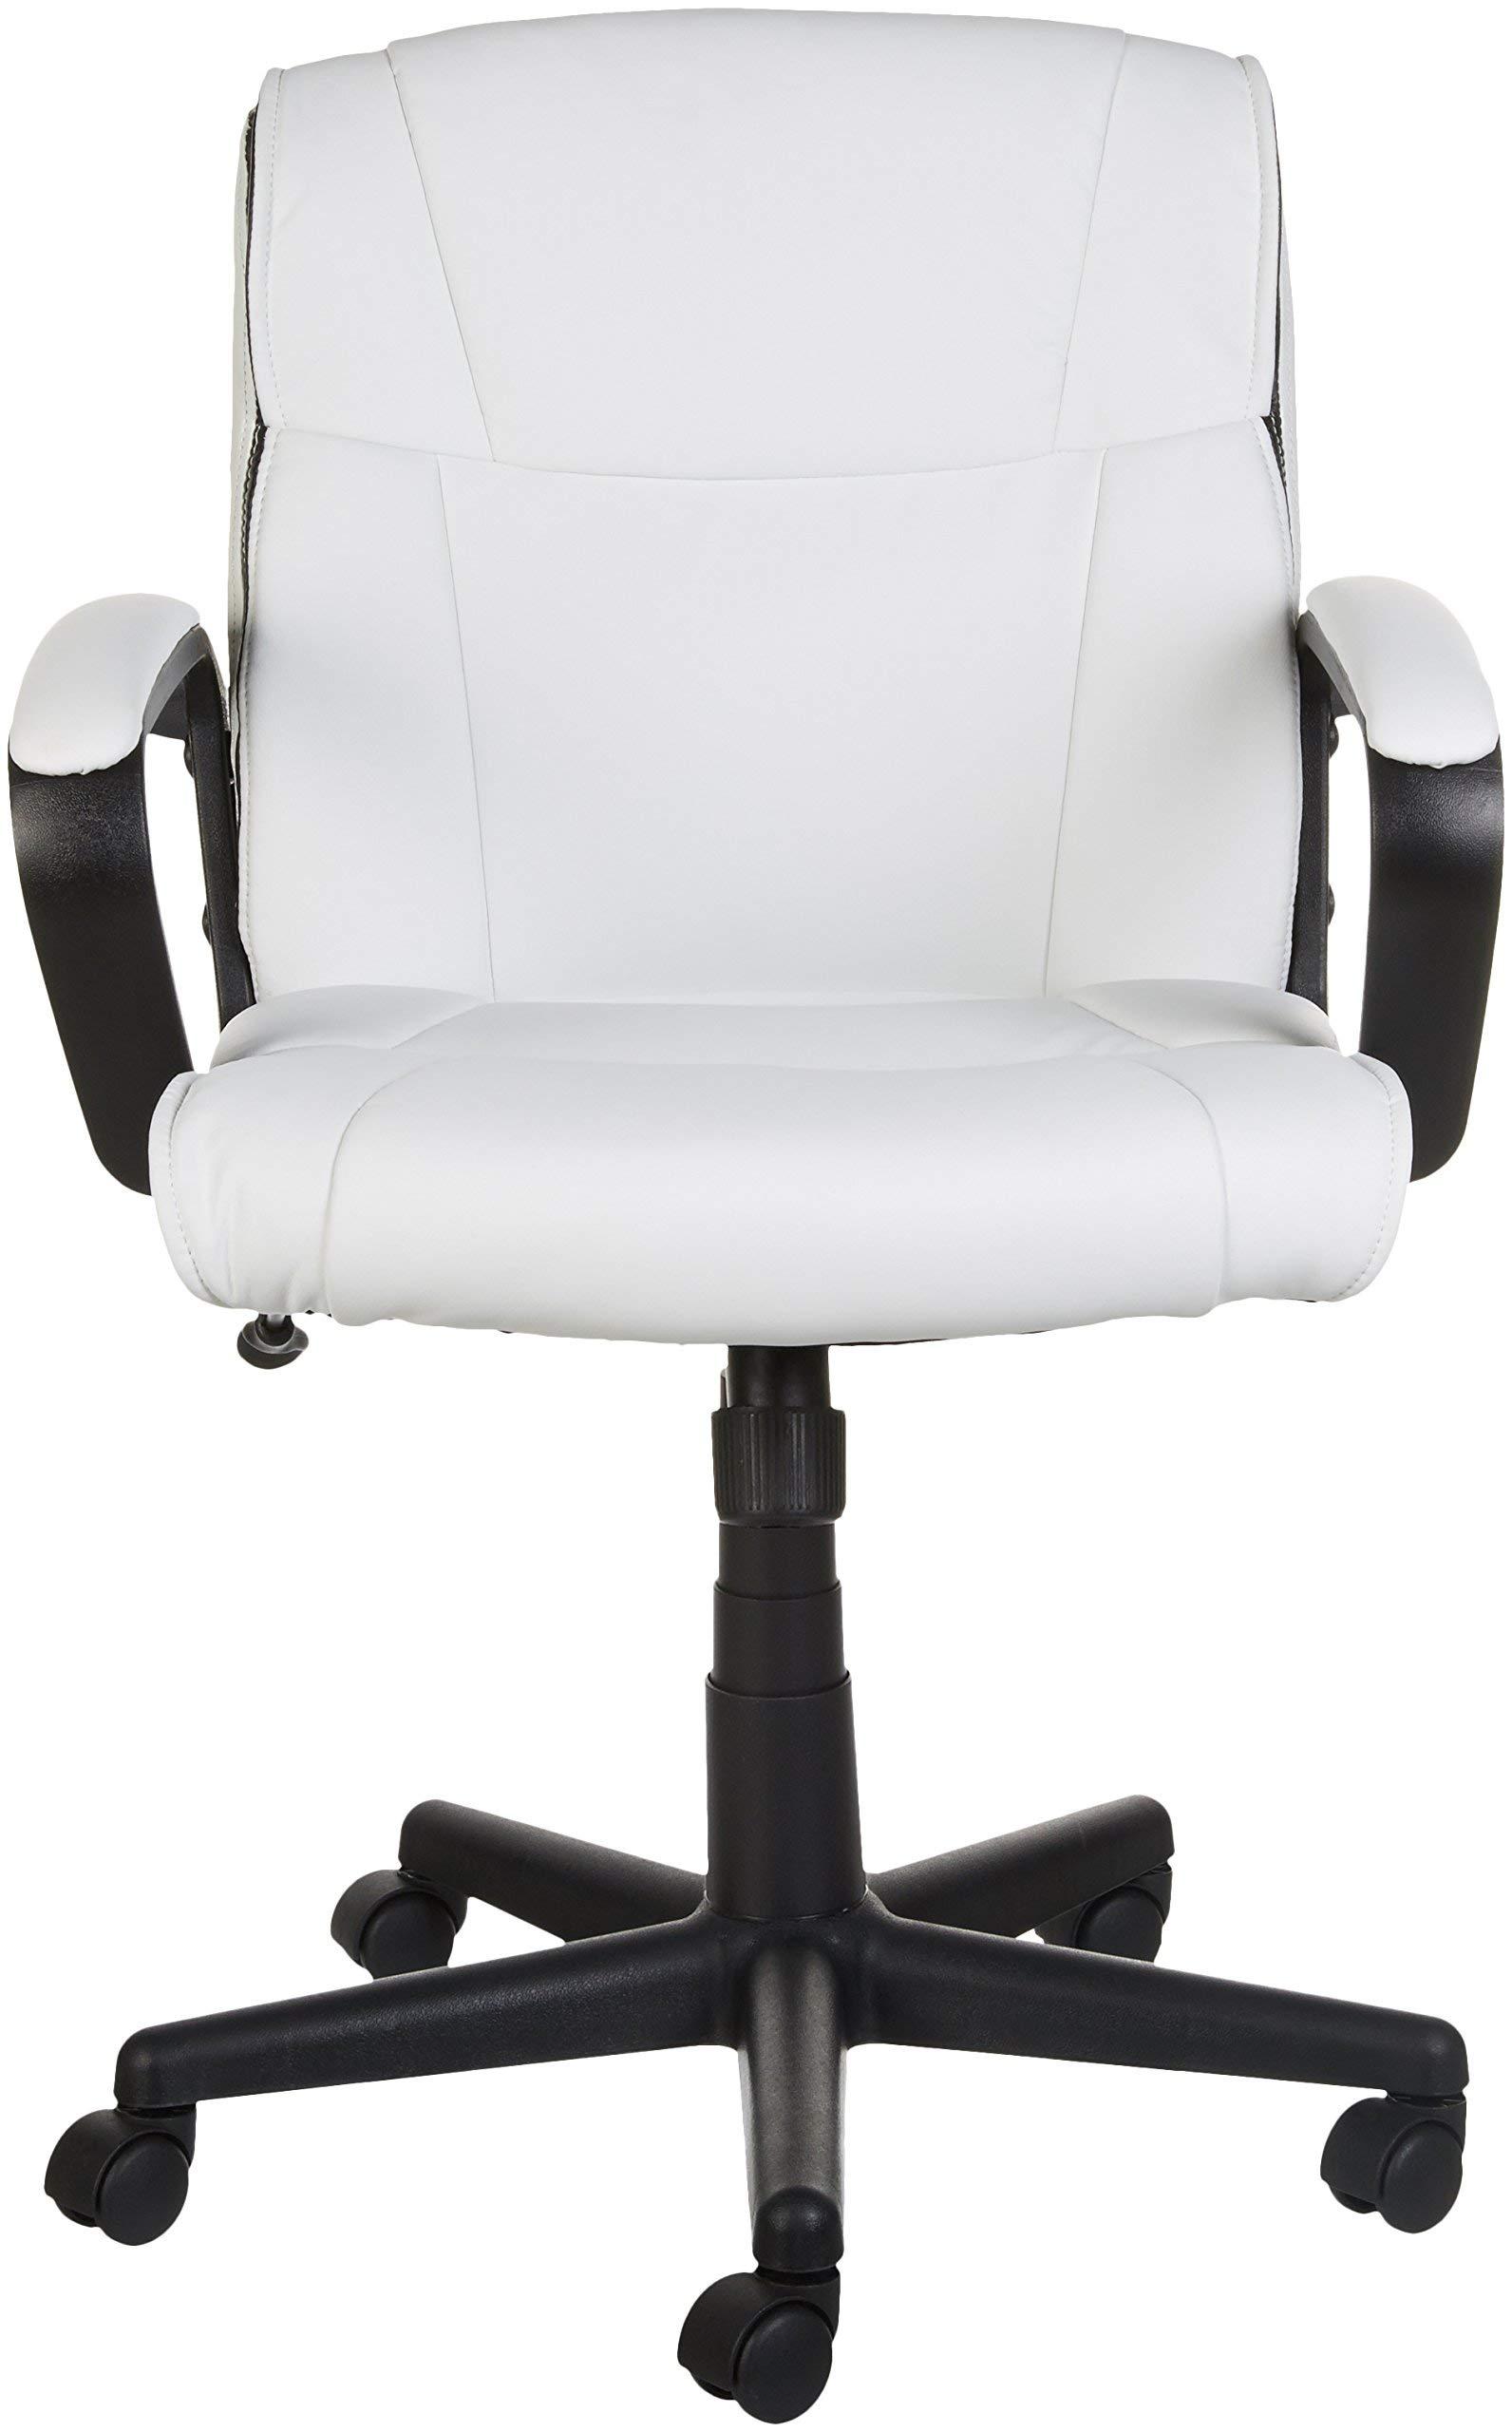 AmazonBasics Classic Leather-Padded Mid-Back Office Chair with Armrest - White by AmazonBasics (Image #3)